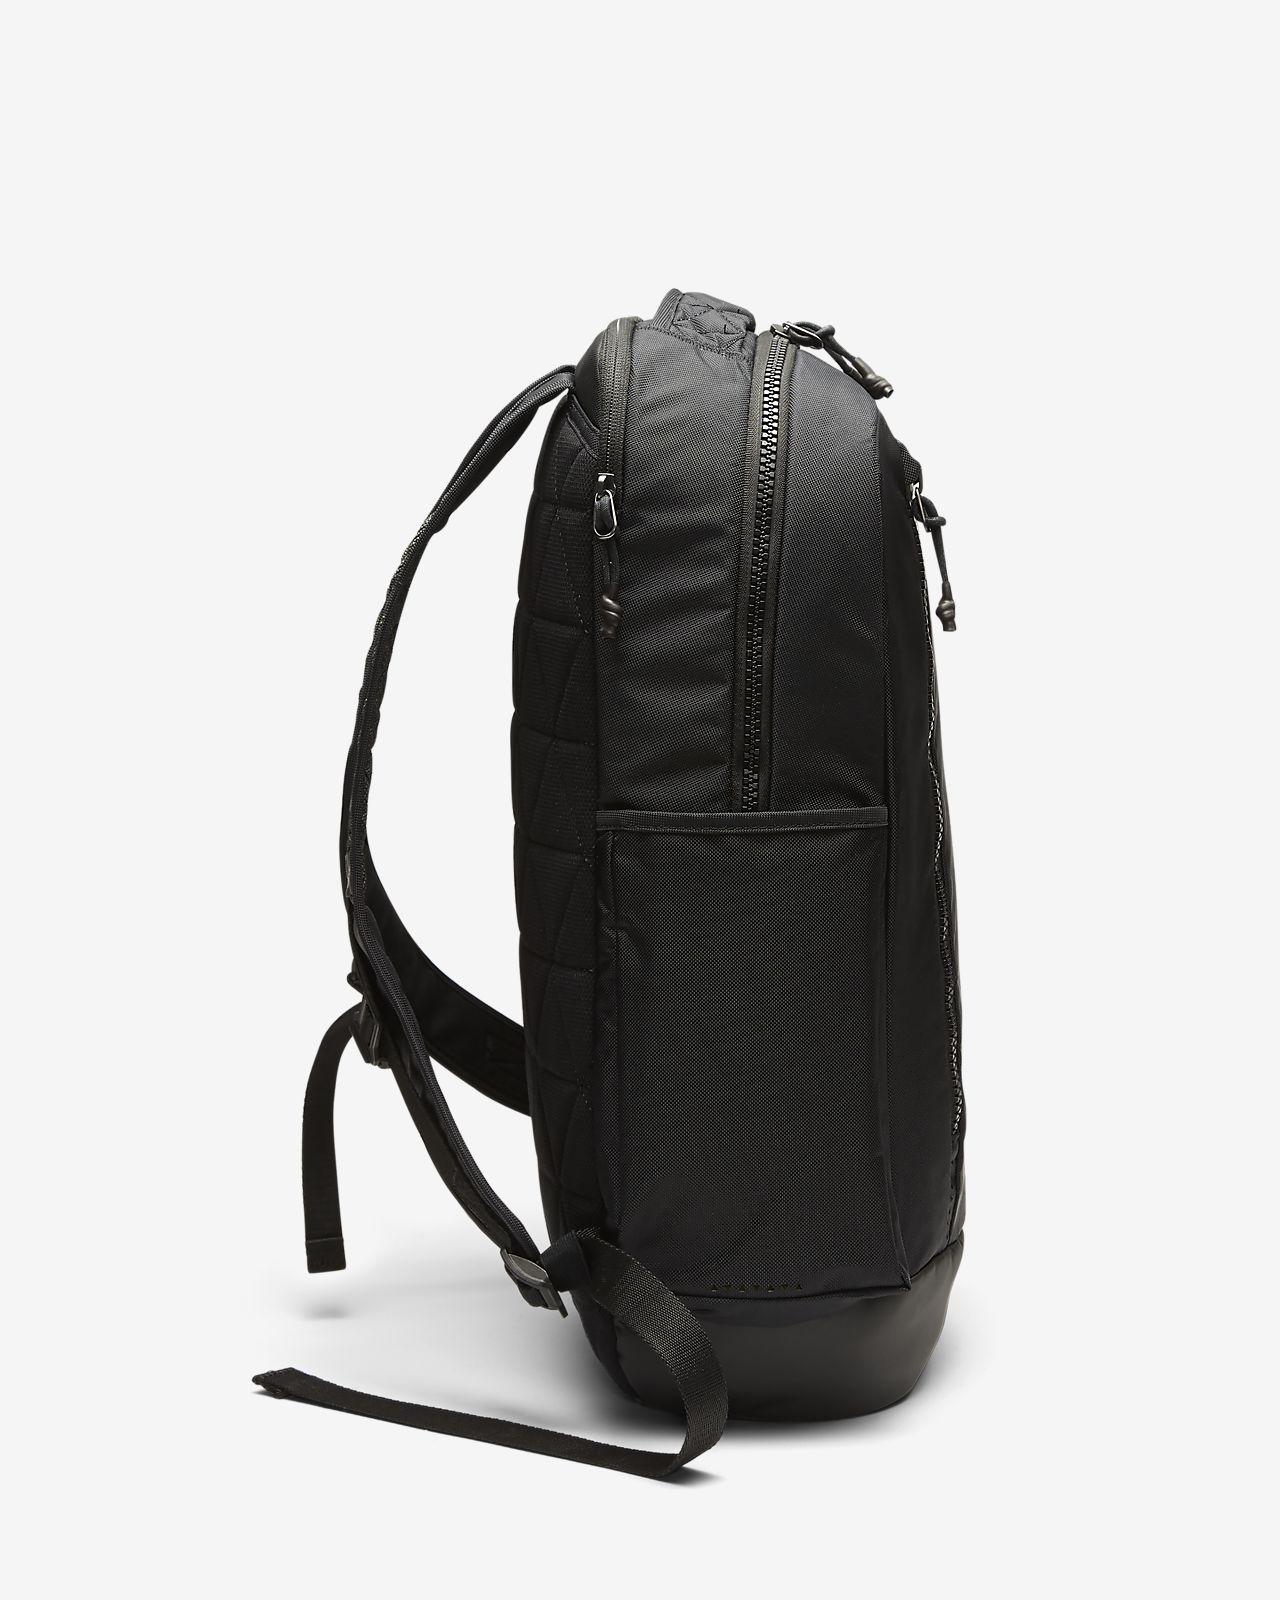 354faa59ff4 Nike Vapor Power 2.0 Training Backpack. Nike.com CA